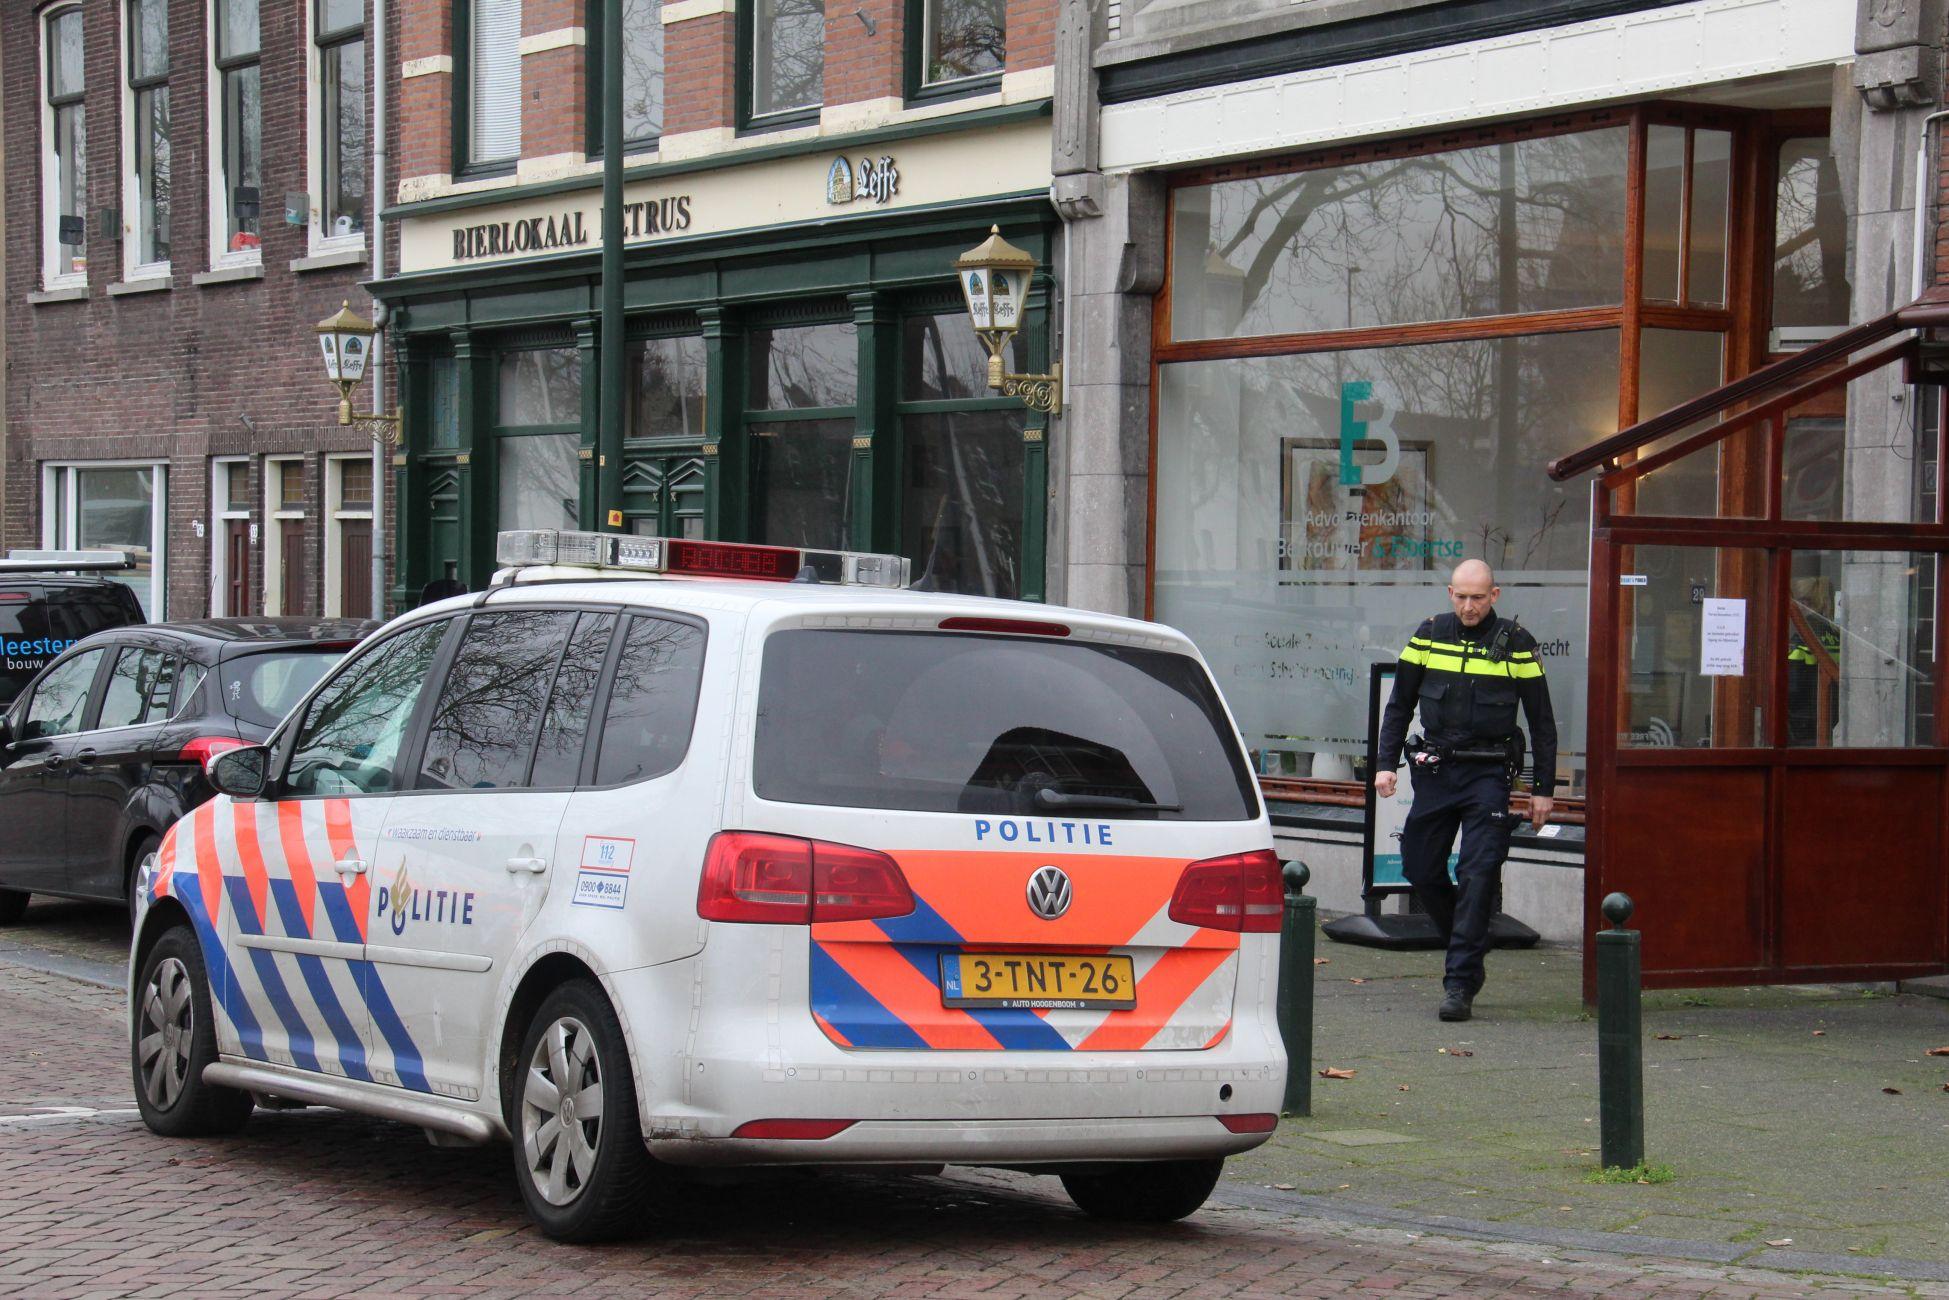 Politie in actie na overvalmelding Westhavenkade